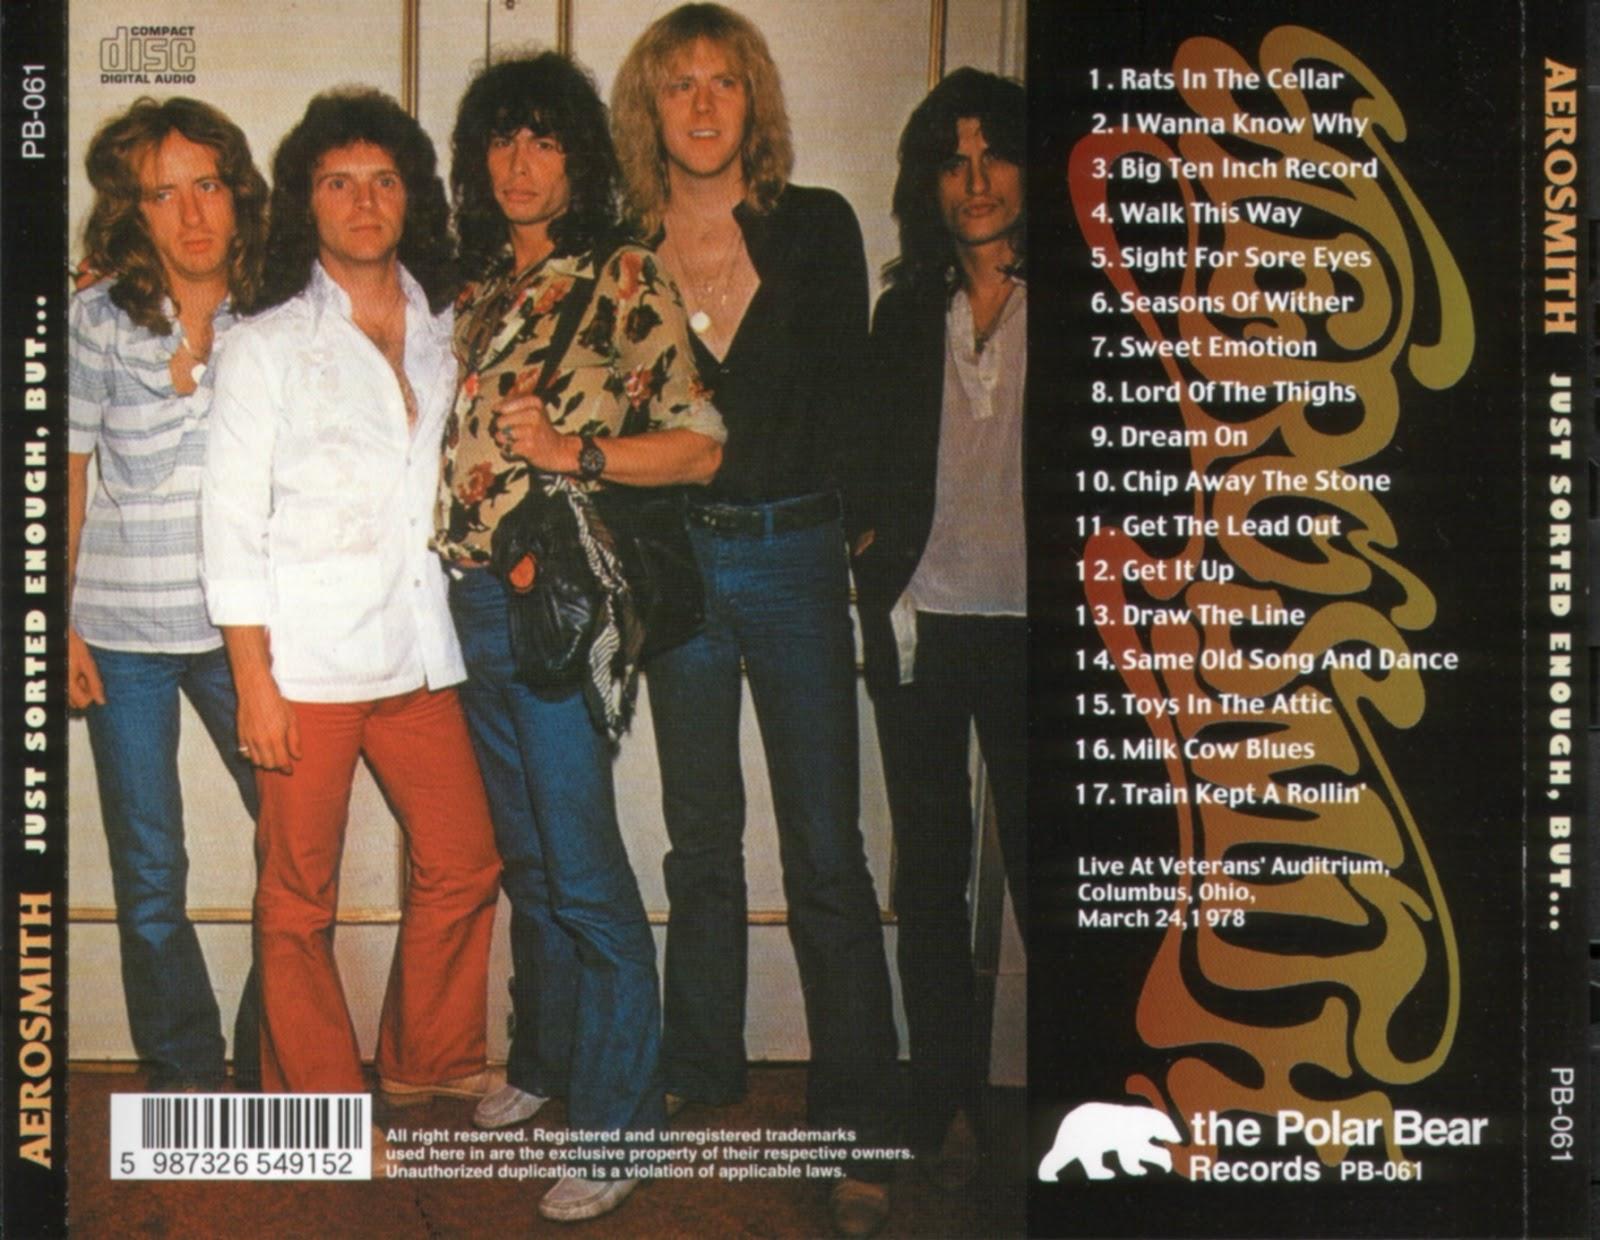 T U B E Aerosmith 1978 03 24 Columbus Oh Fm Flac